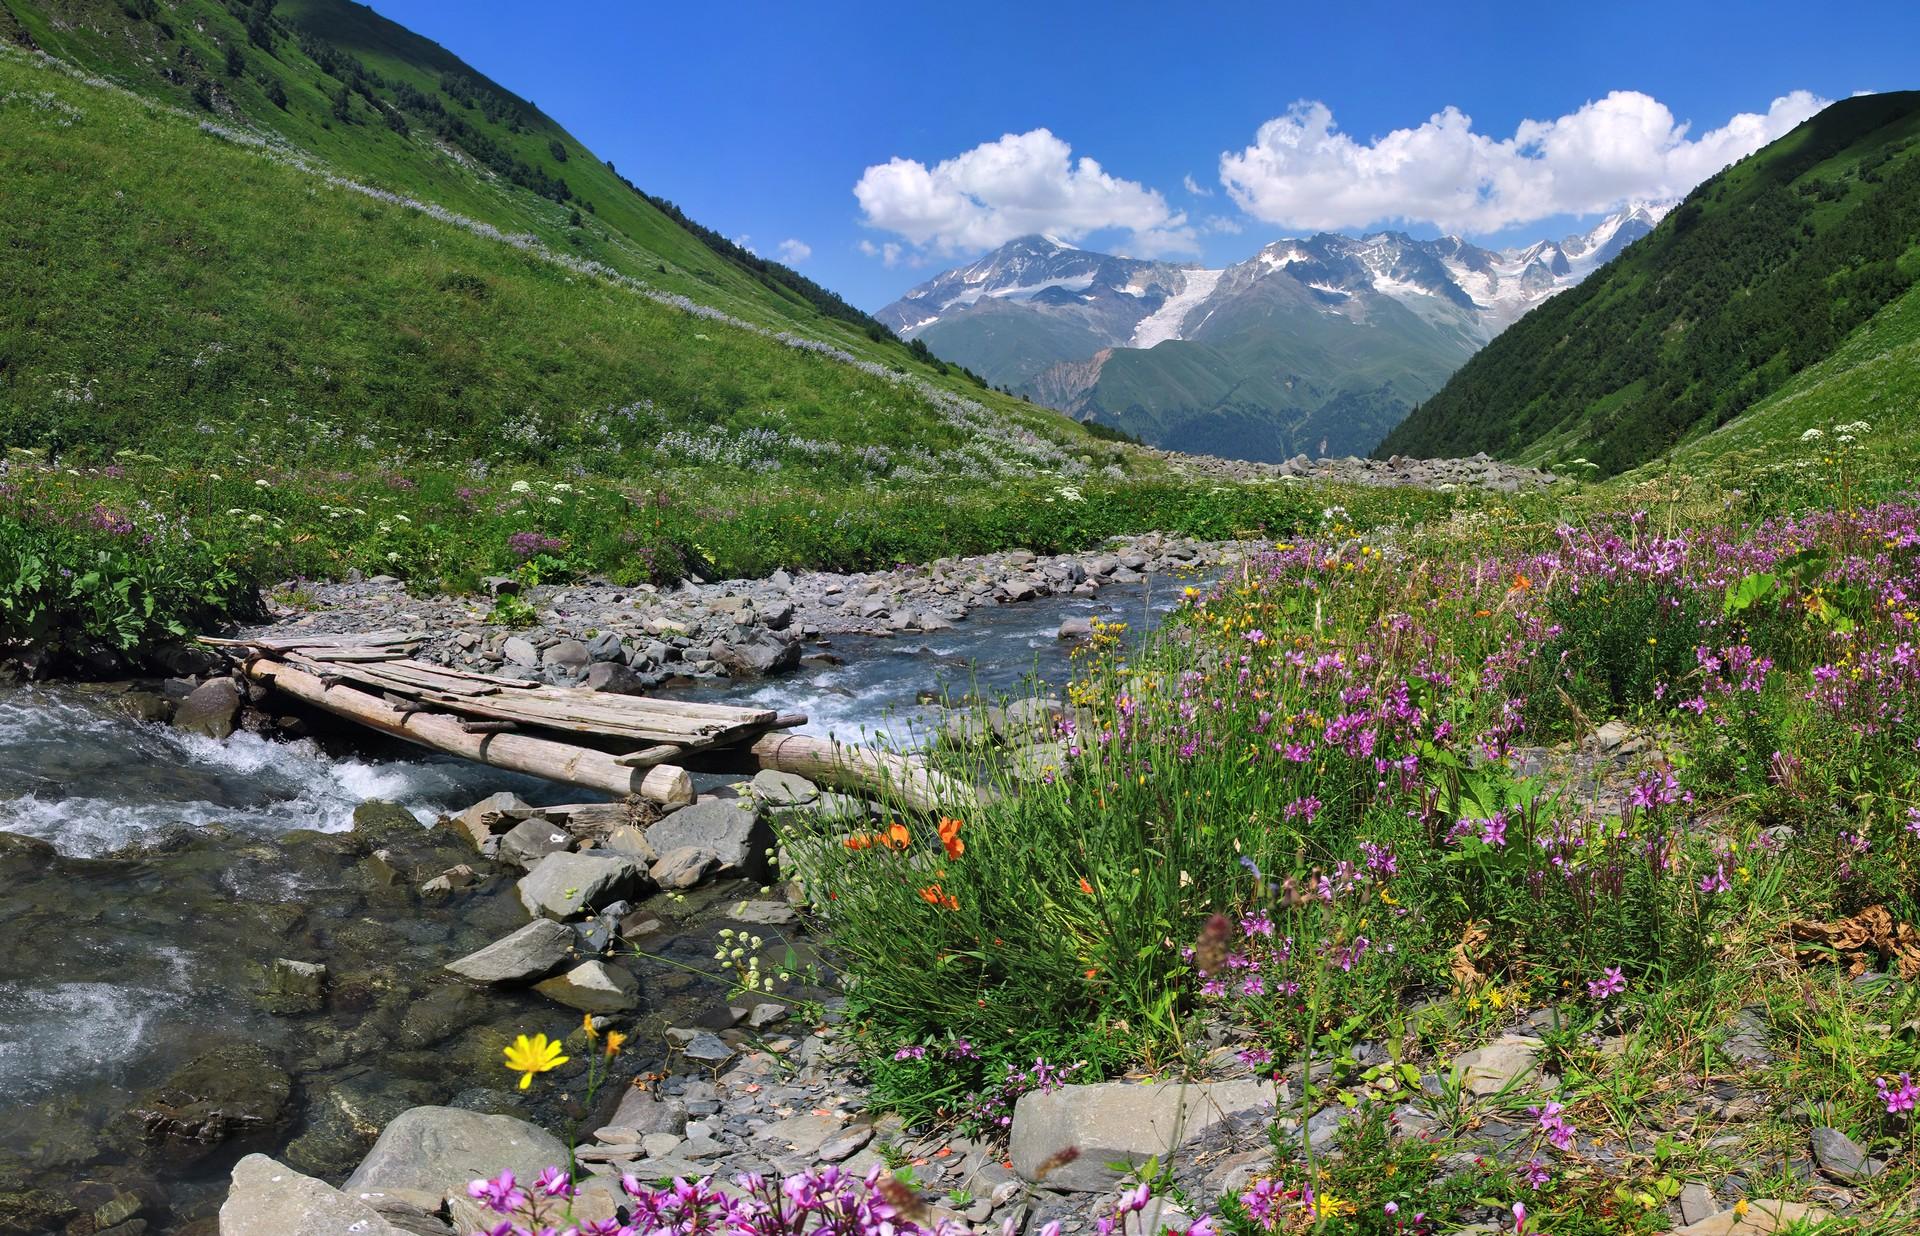 A stream running through Shovi in the Svaneti region of Georgia